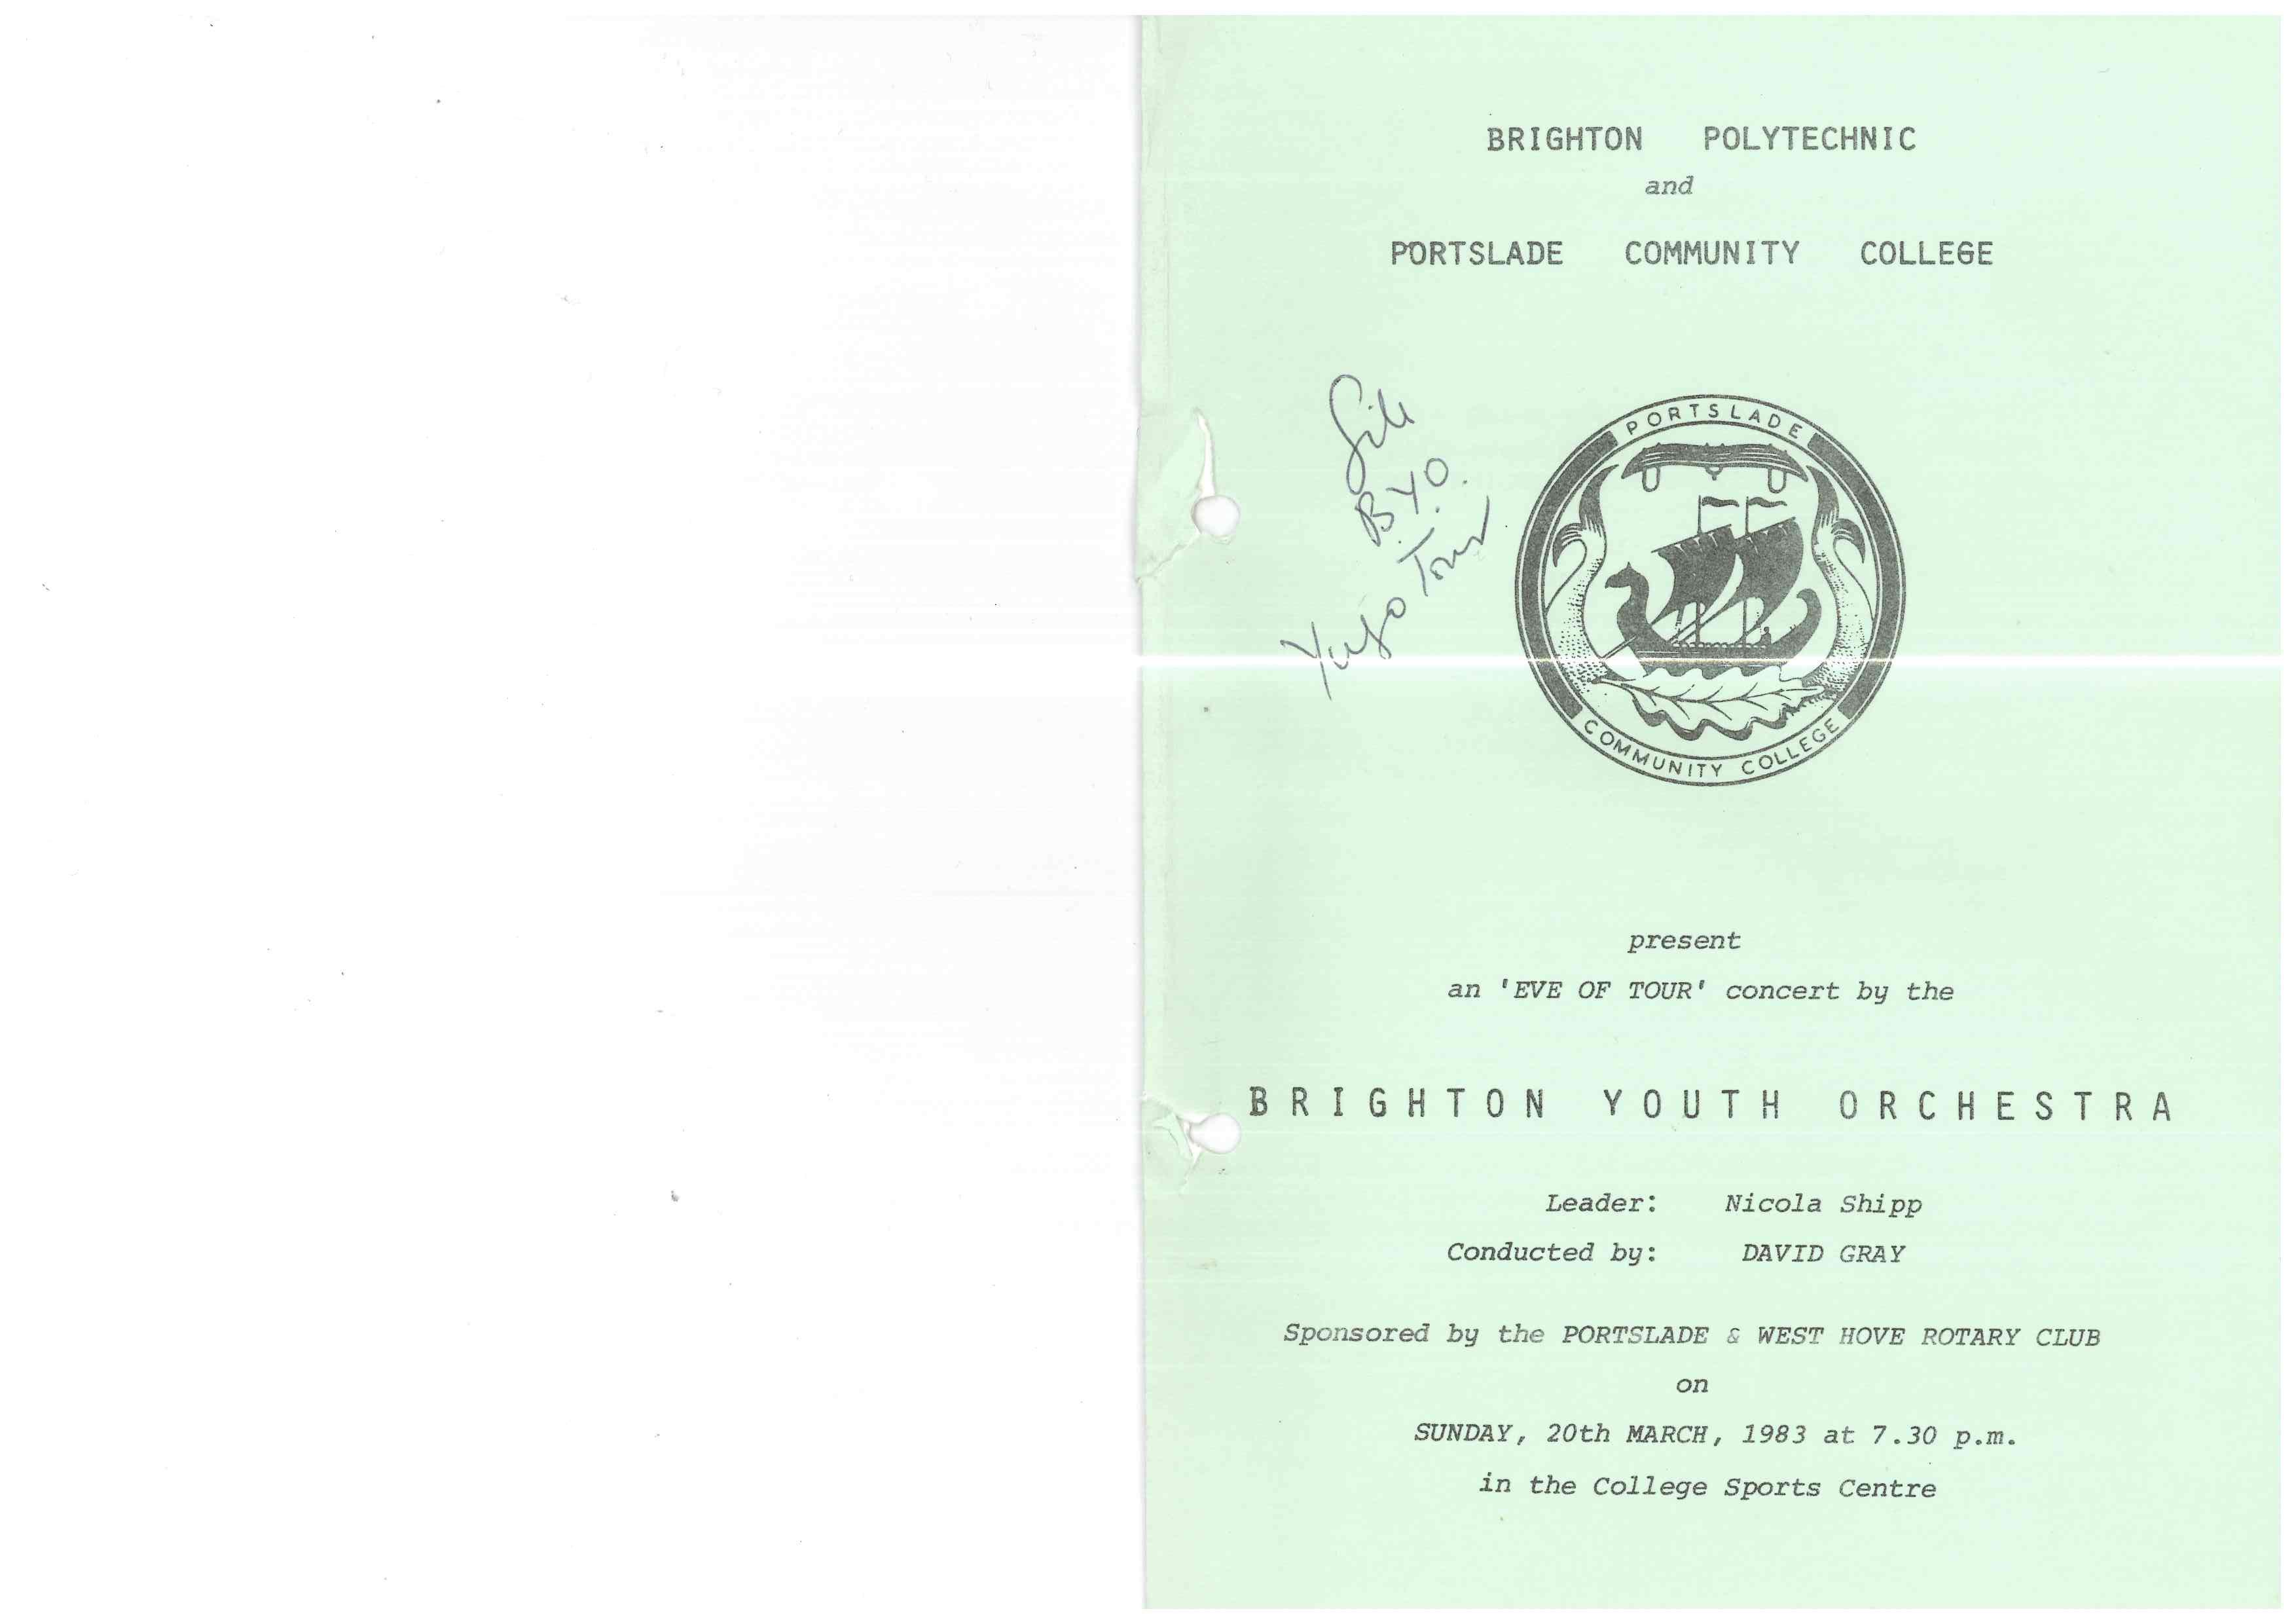 00228-BYO Rotary Club, 20th March 1983.jpg